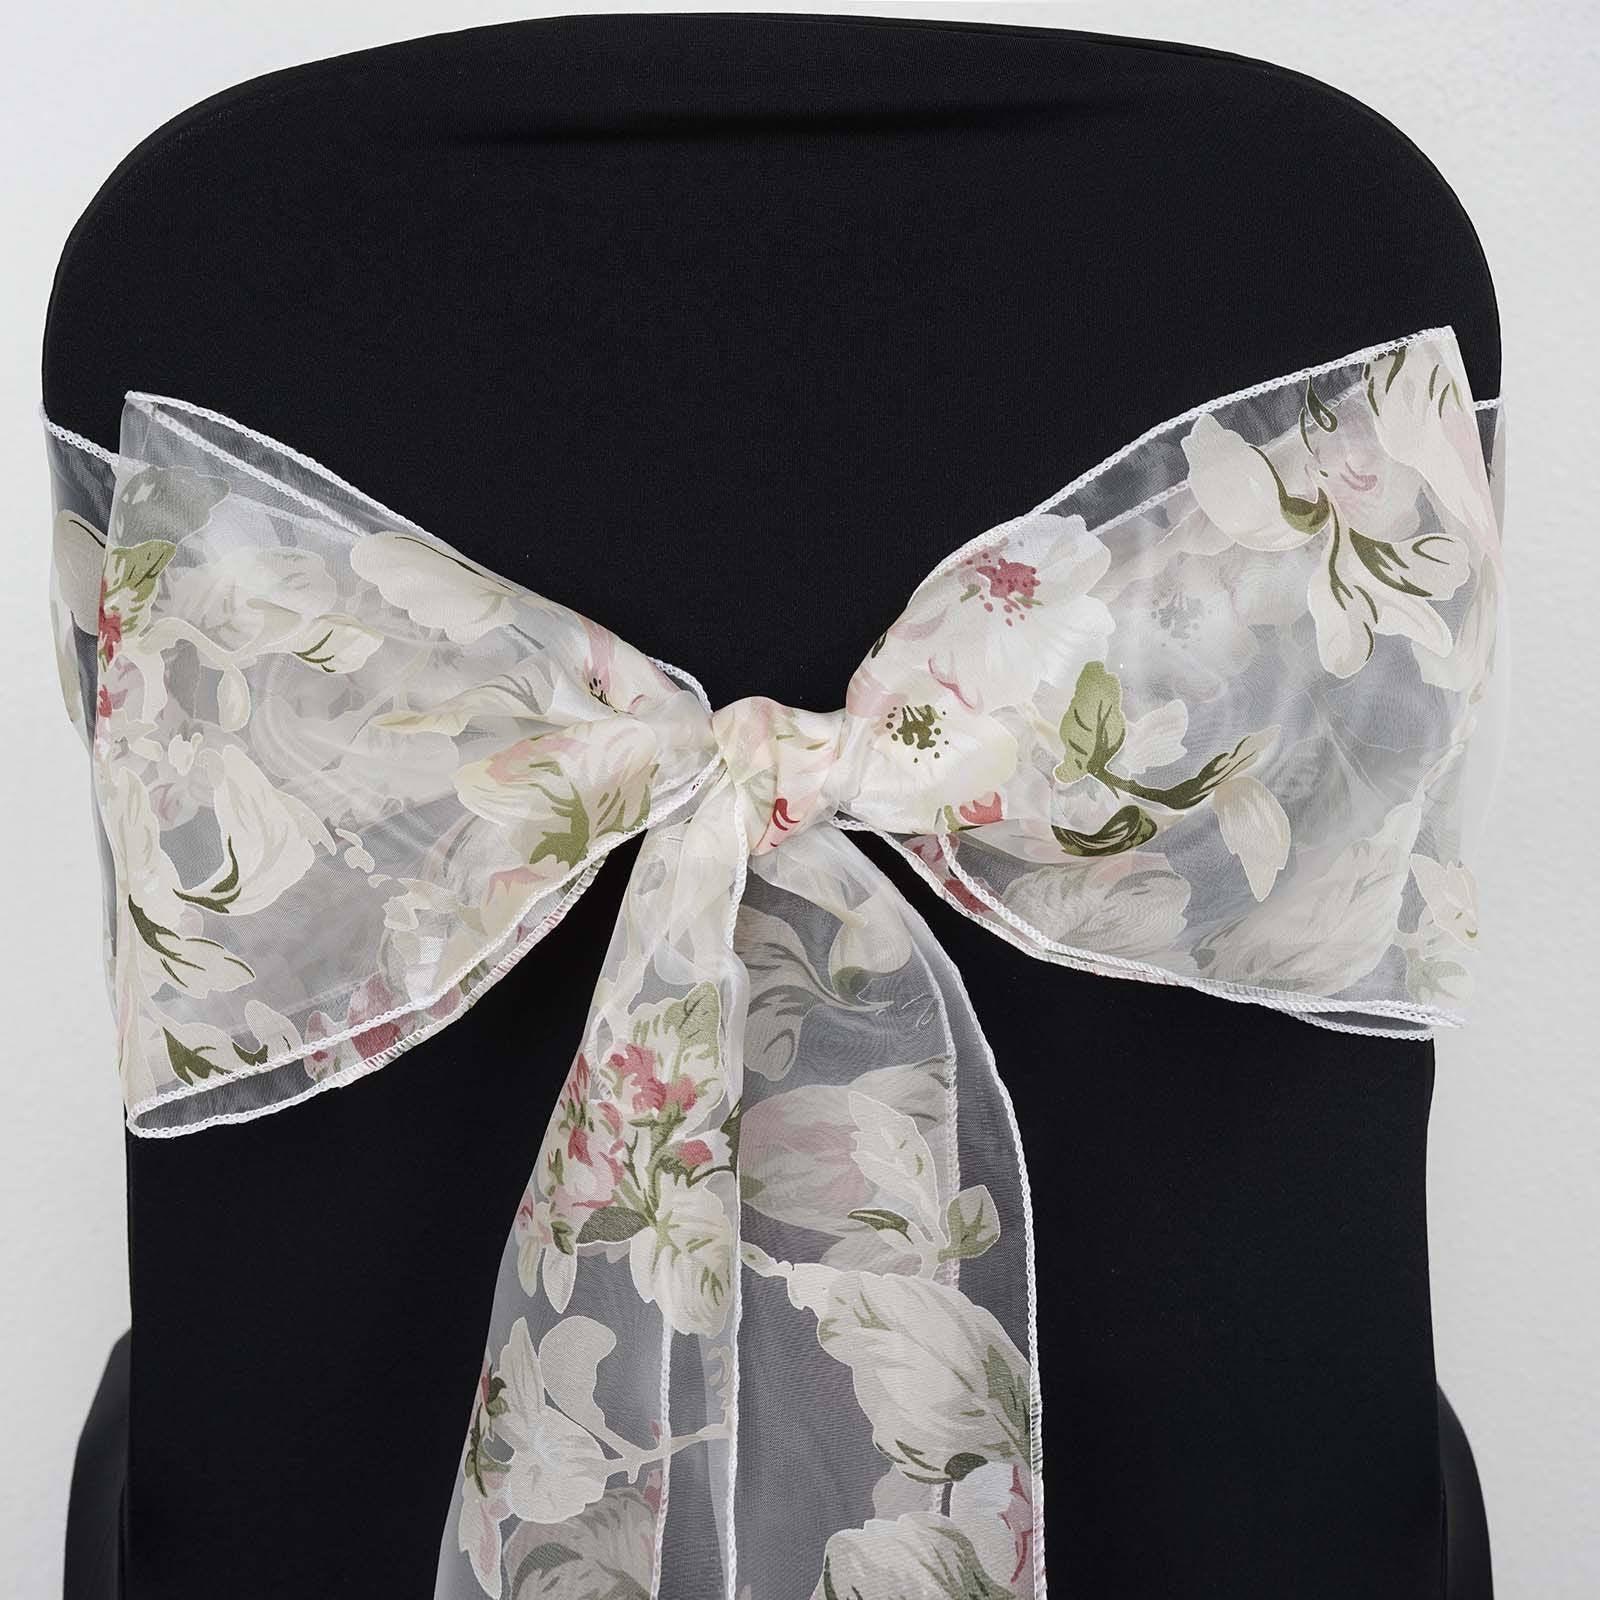 blush chair sashes shaker tape white sheer organza sash with roses designs